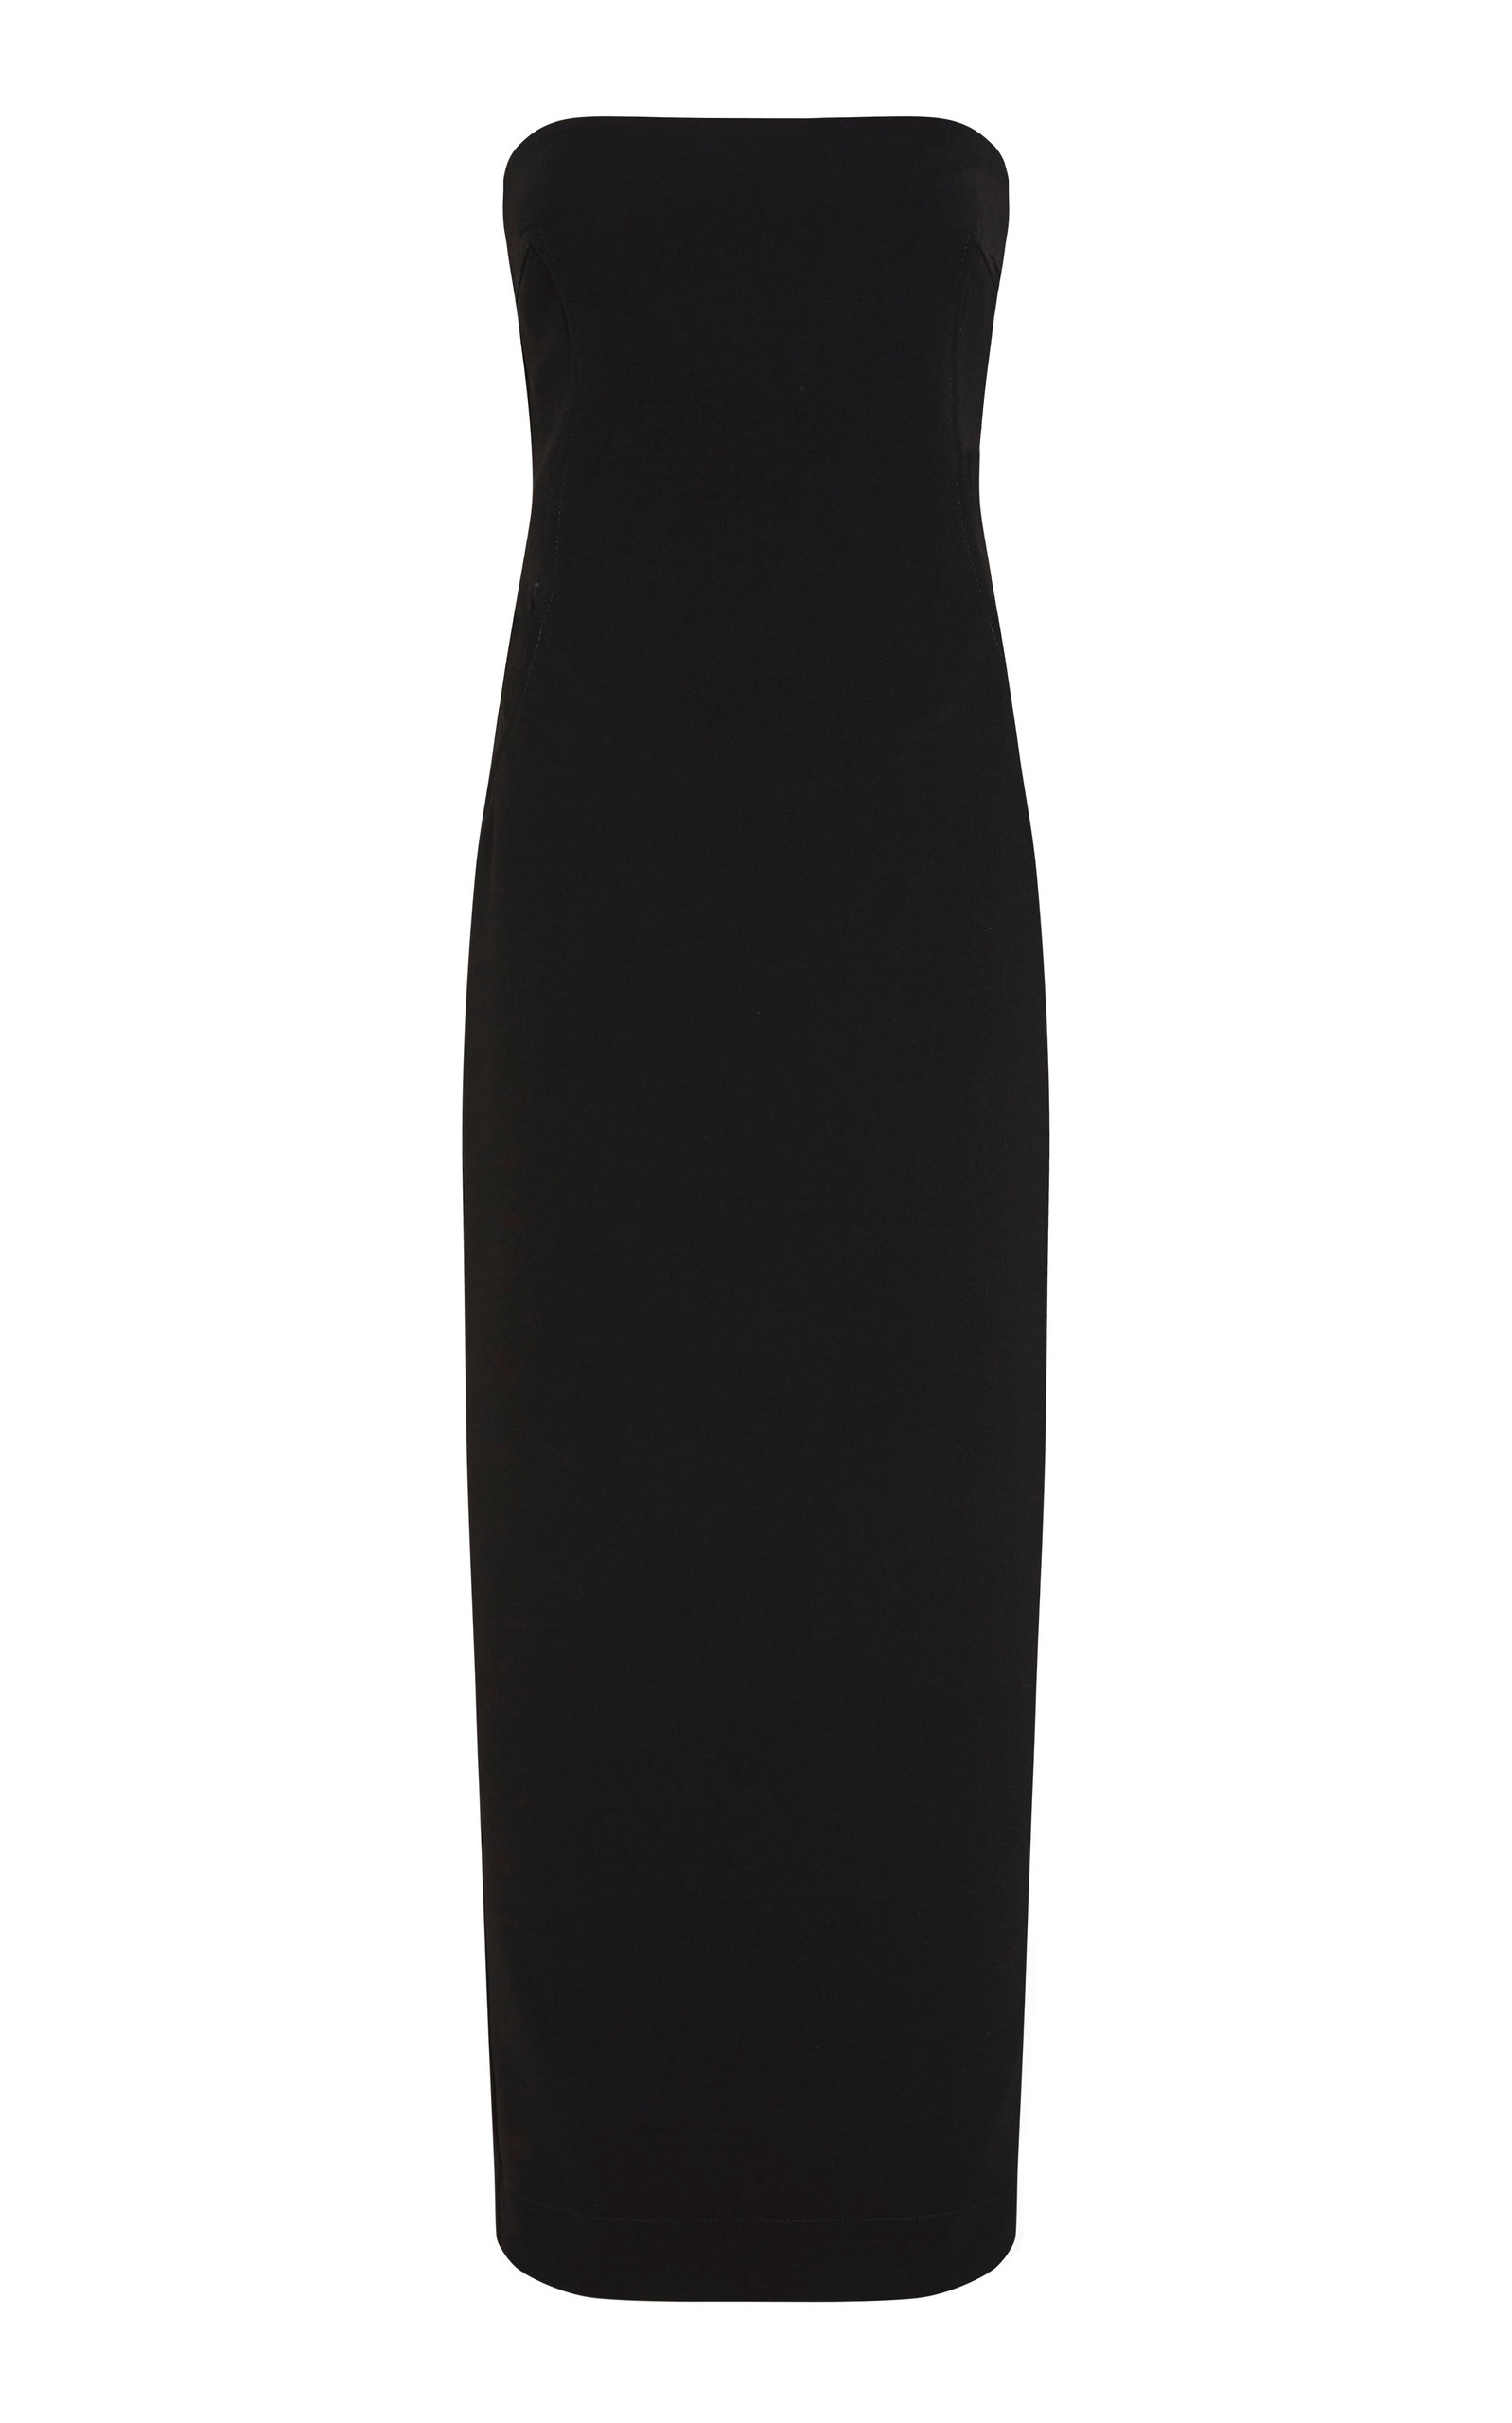 Paris Georgia Women's Audrey Strapless Satin Maxi Dress In Black